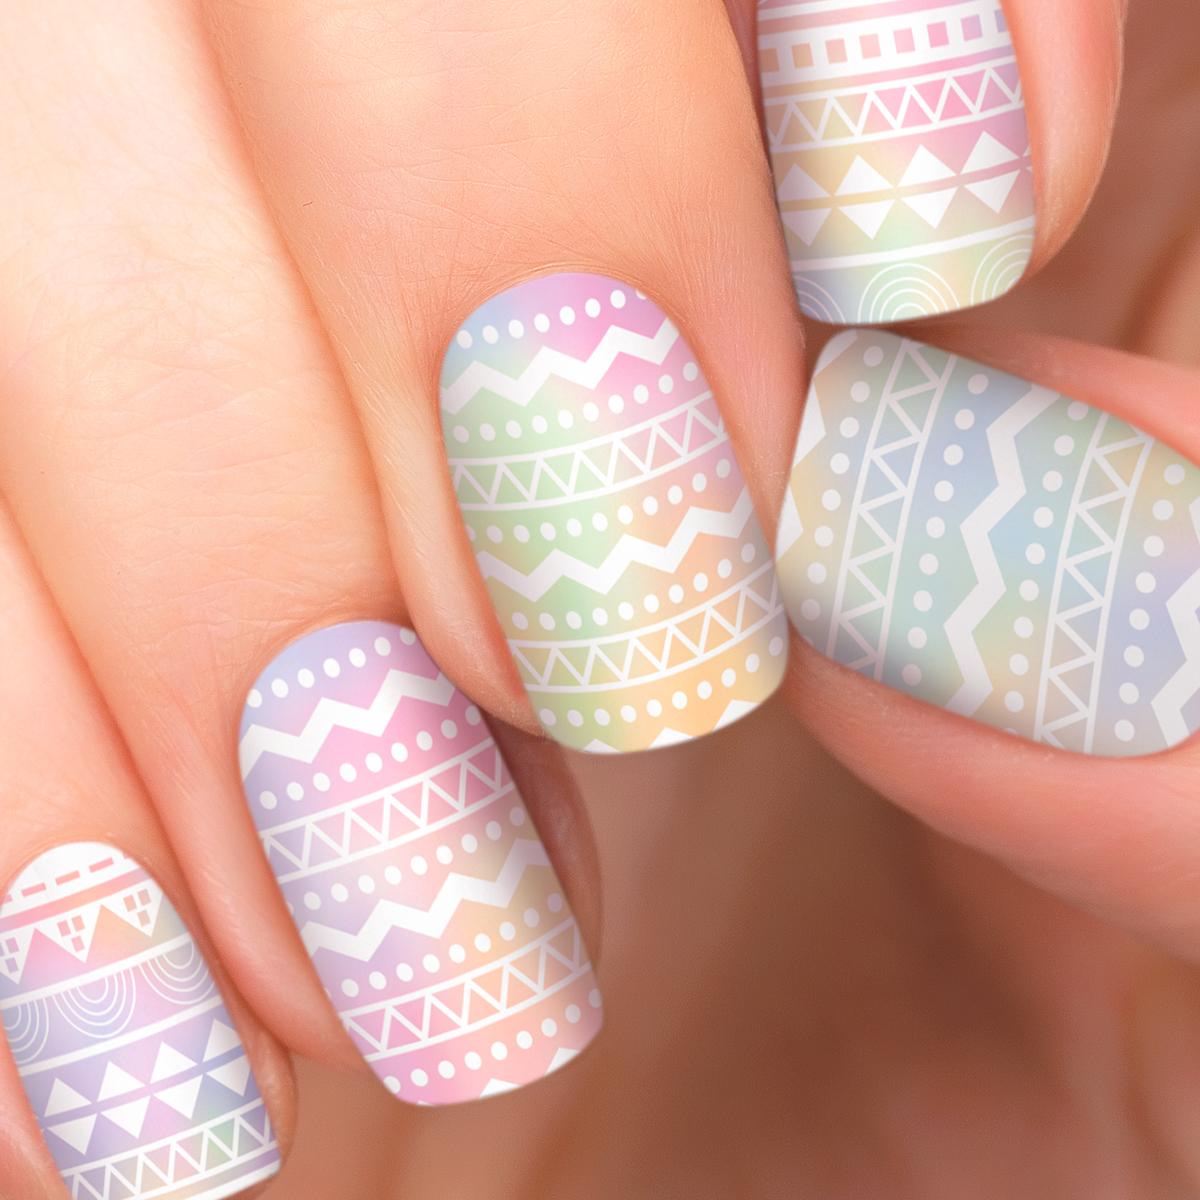 Incoco.com Incoco Nail Polish Strips, Candy Colors